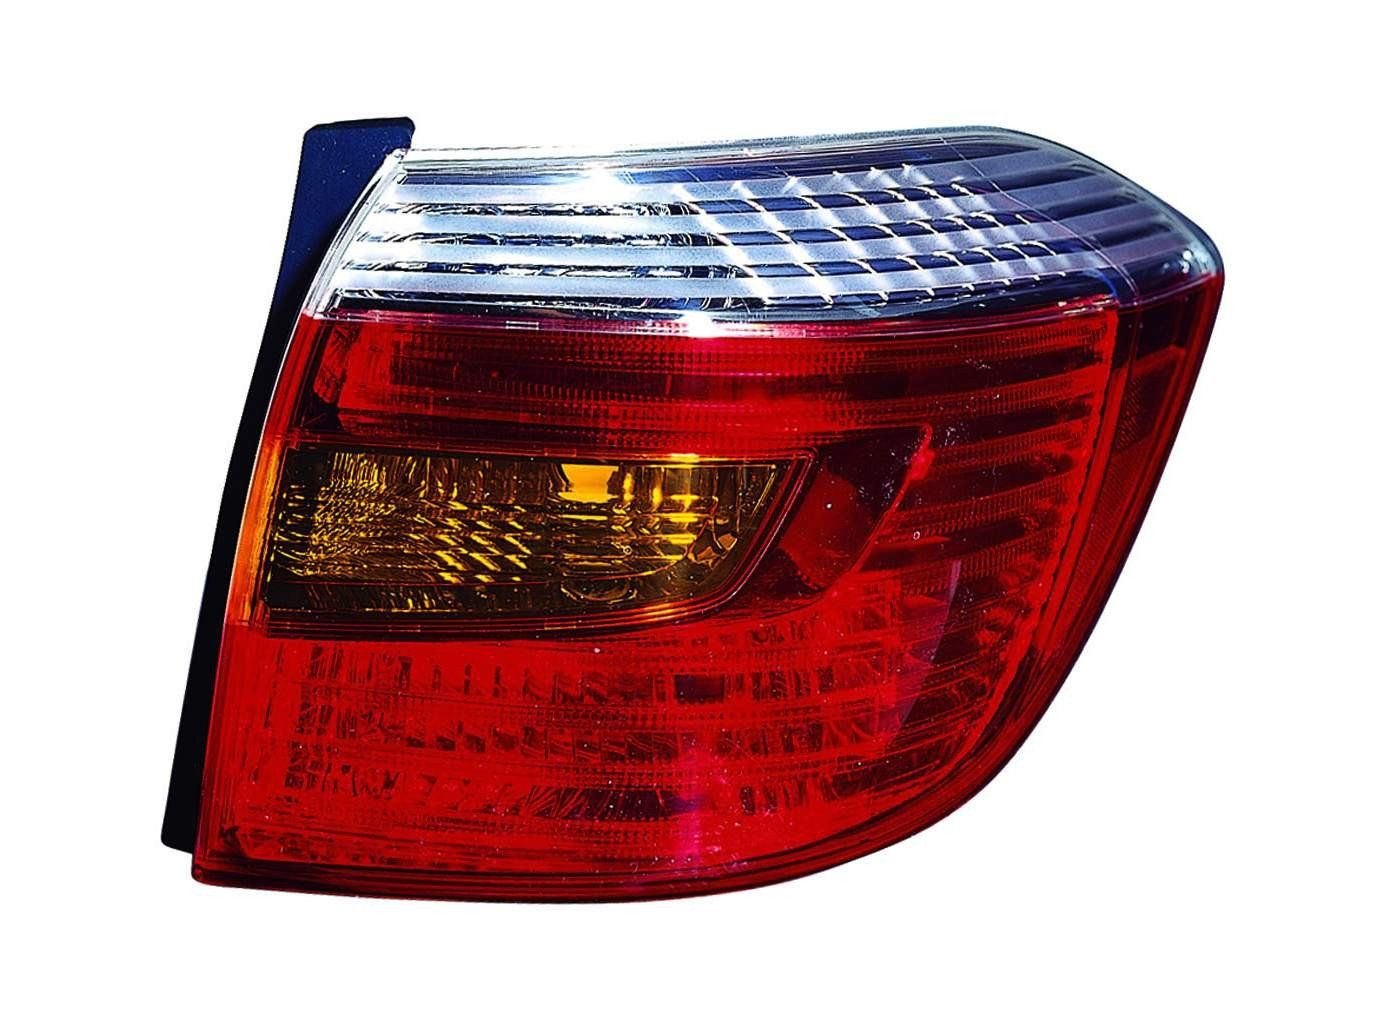 Toyota Highlander 08-10 Tail Light Unit Sport Model RH USA Passenger Side NSF